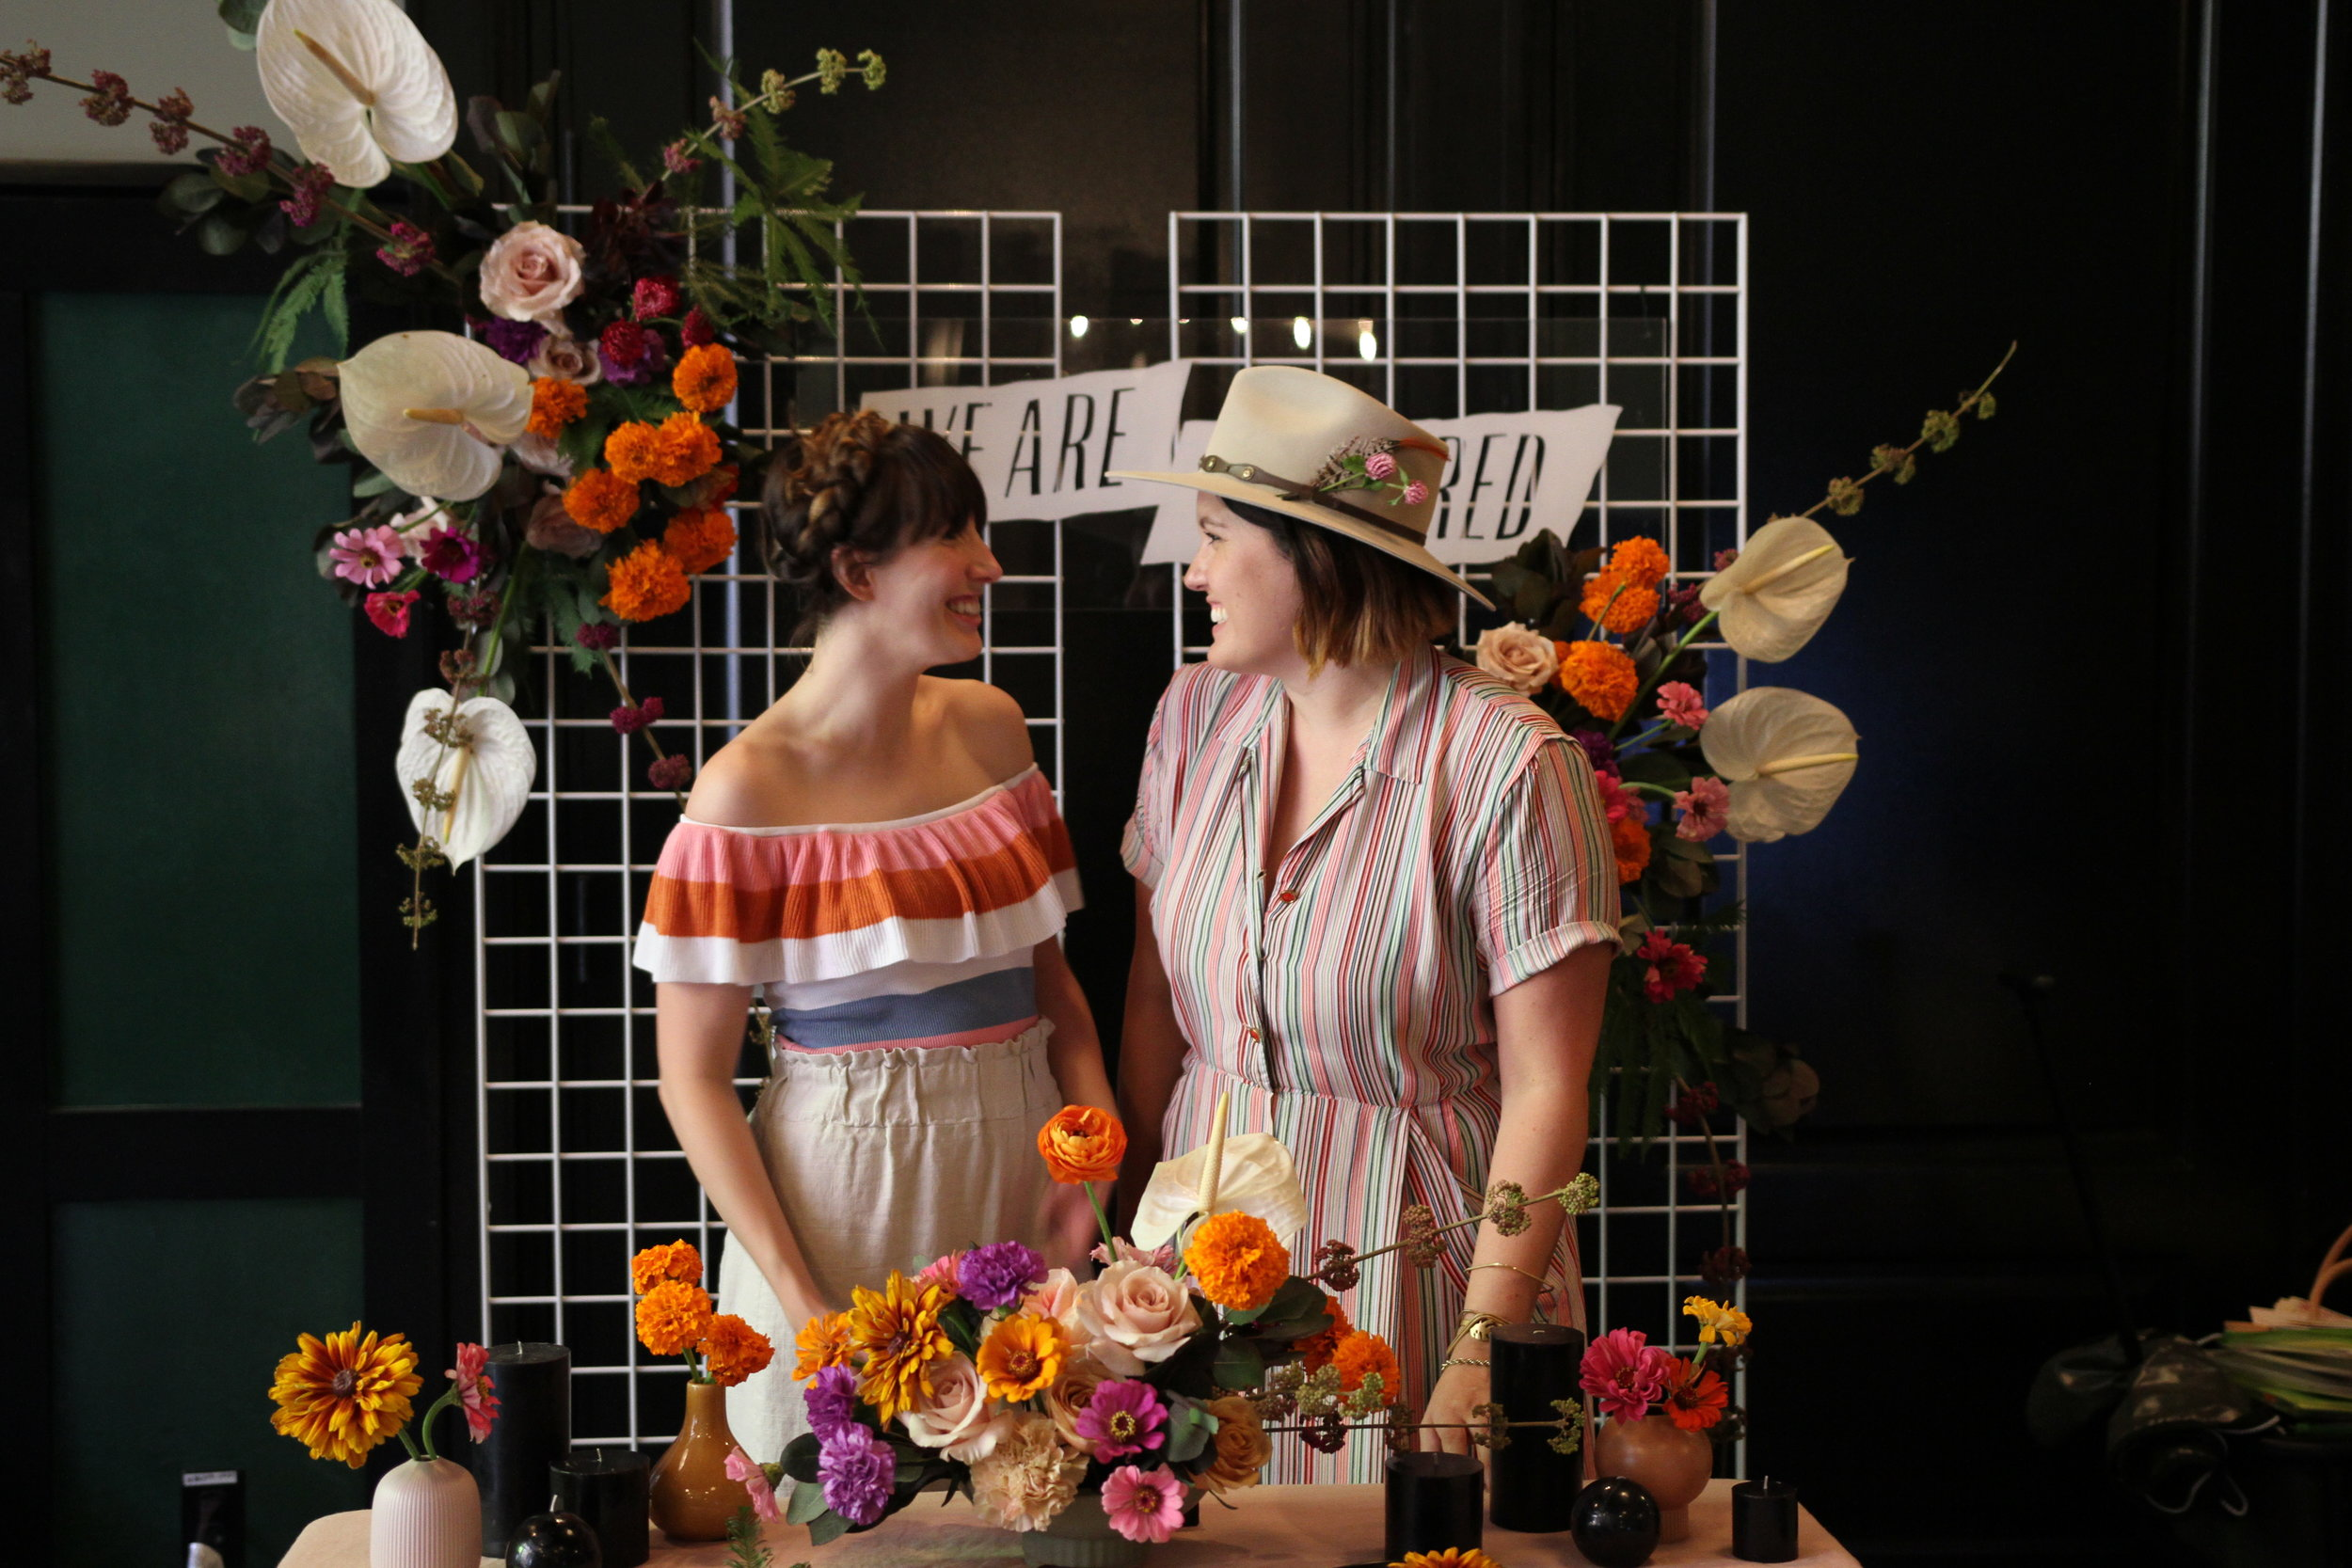 Elizabeth Prine (left) & Kayla Jobe (right)